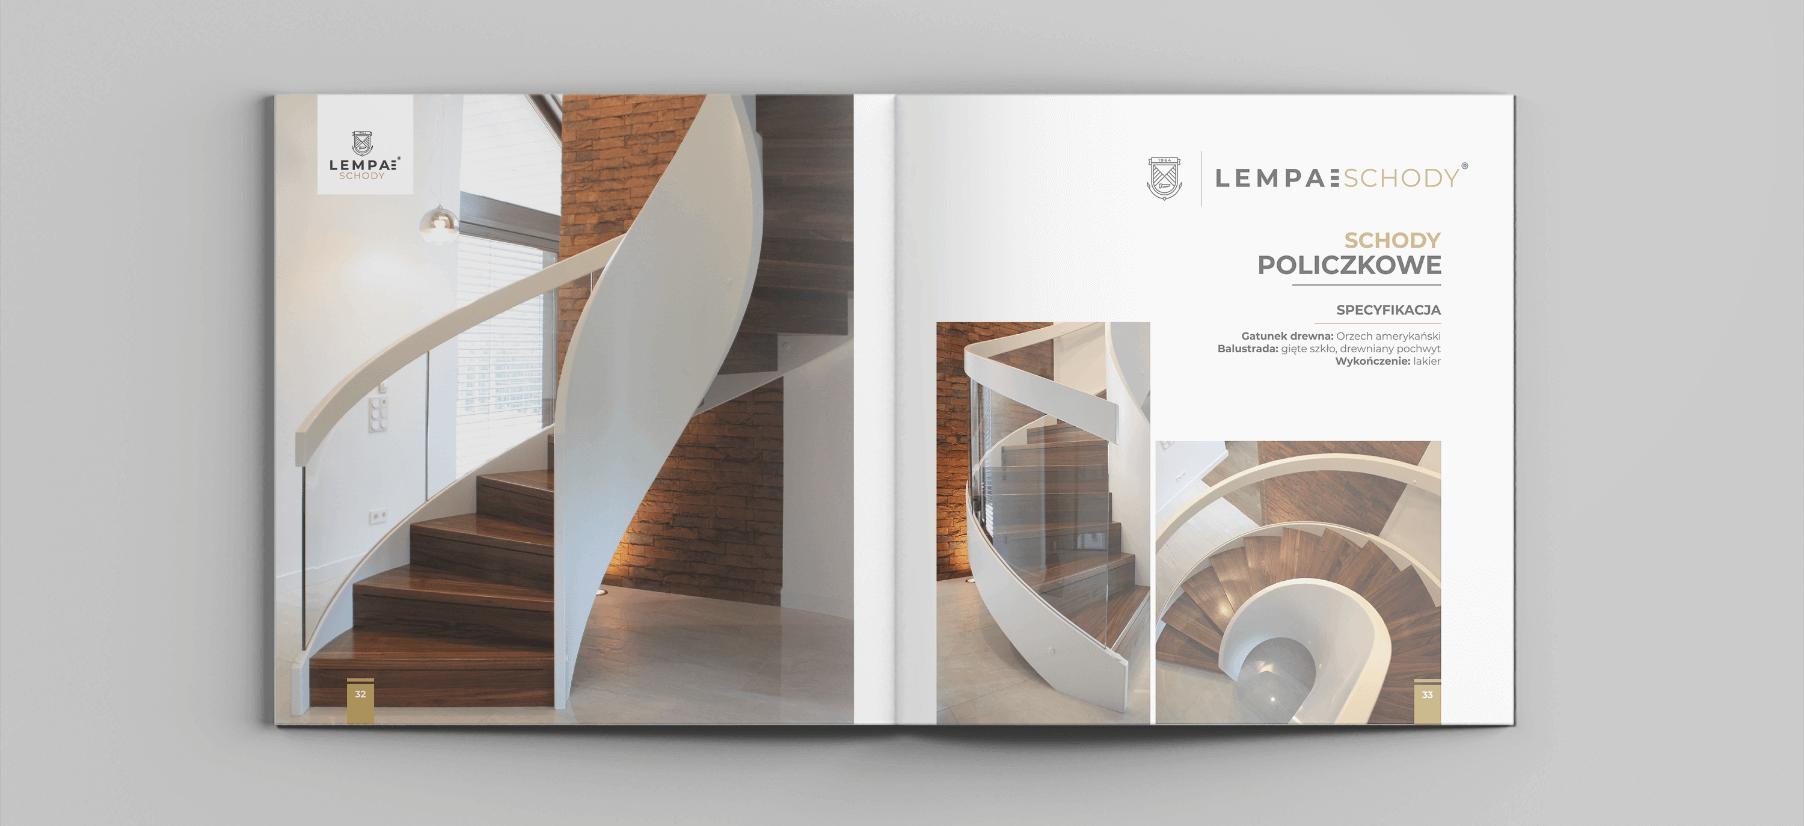 katalog-produktowy-lempa-2